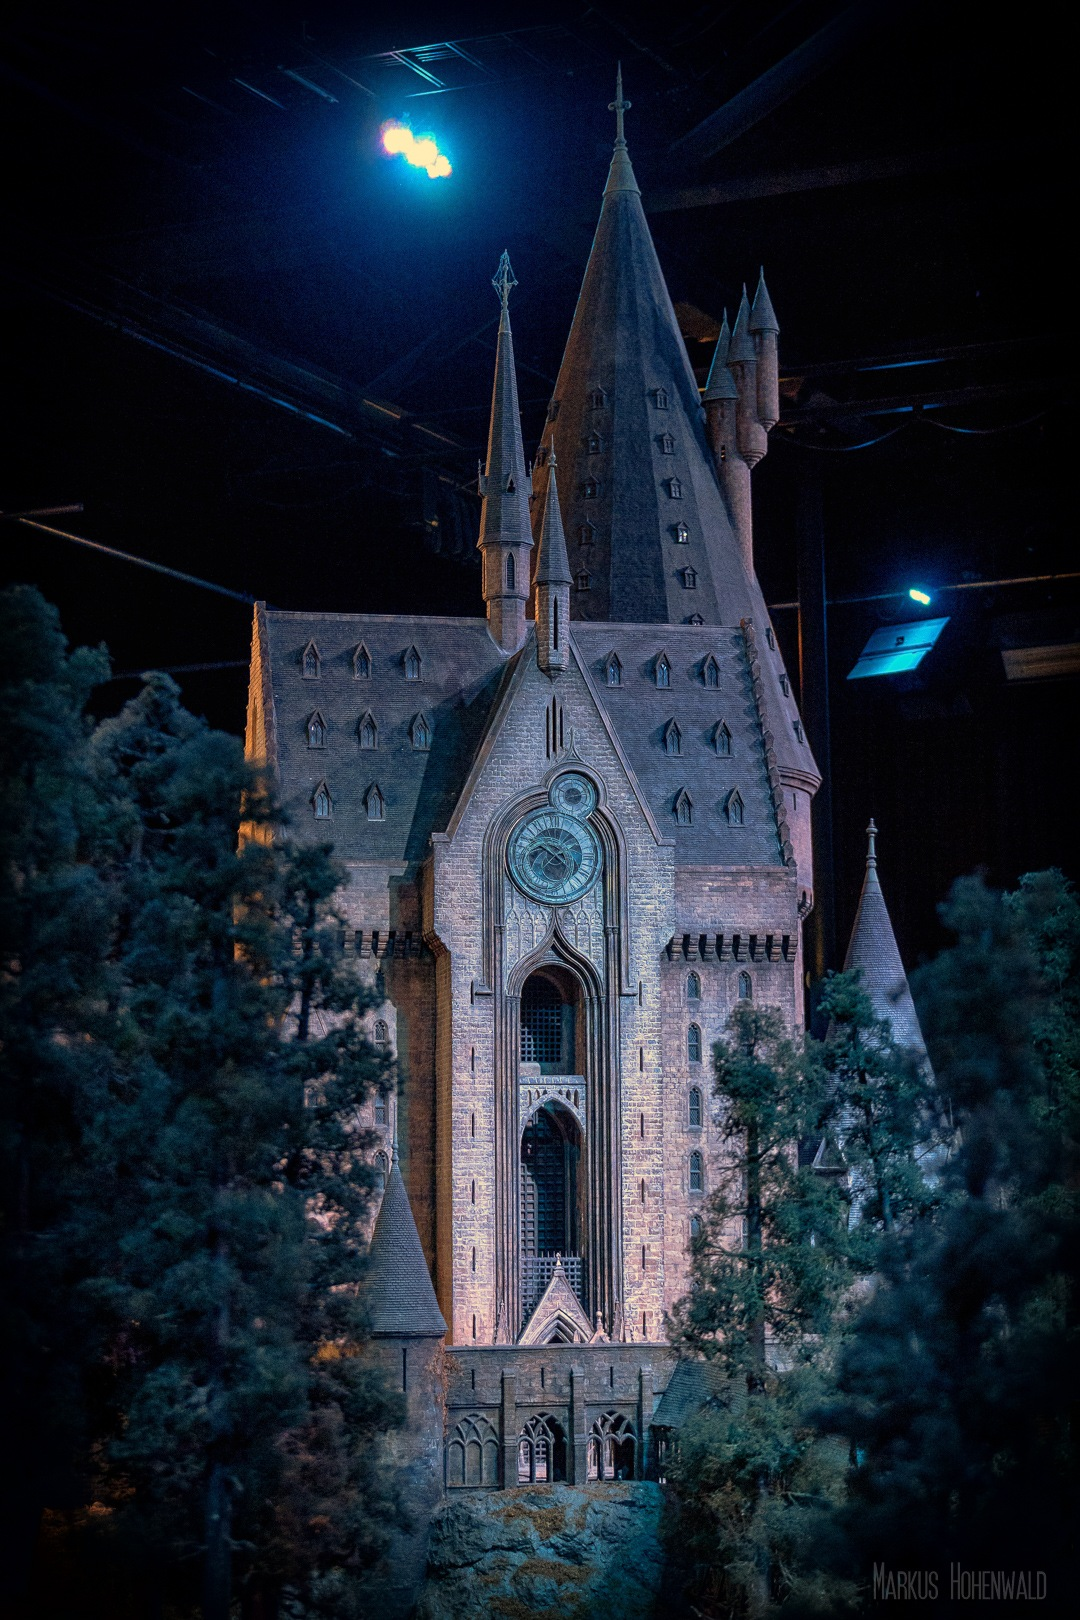 Warner Bros. Studio Tour London by Markus Hohenwald